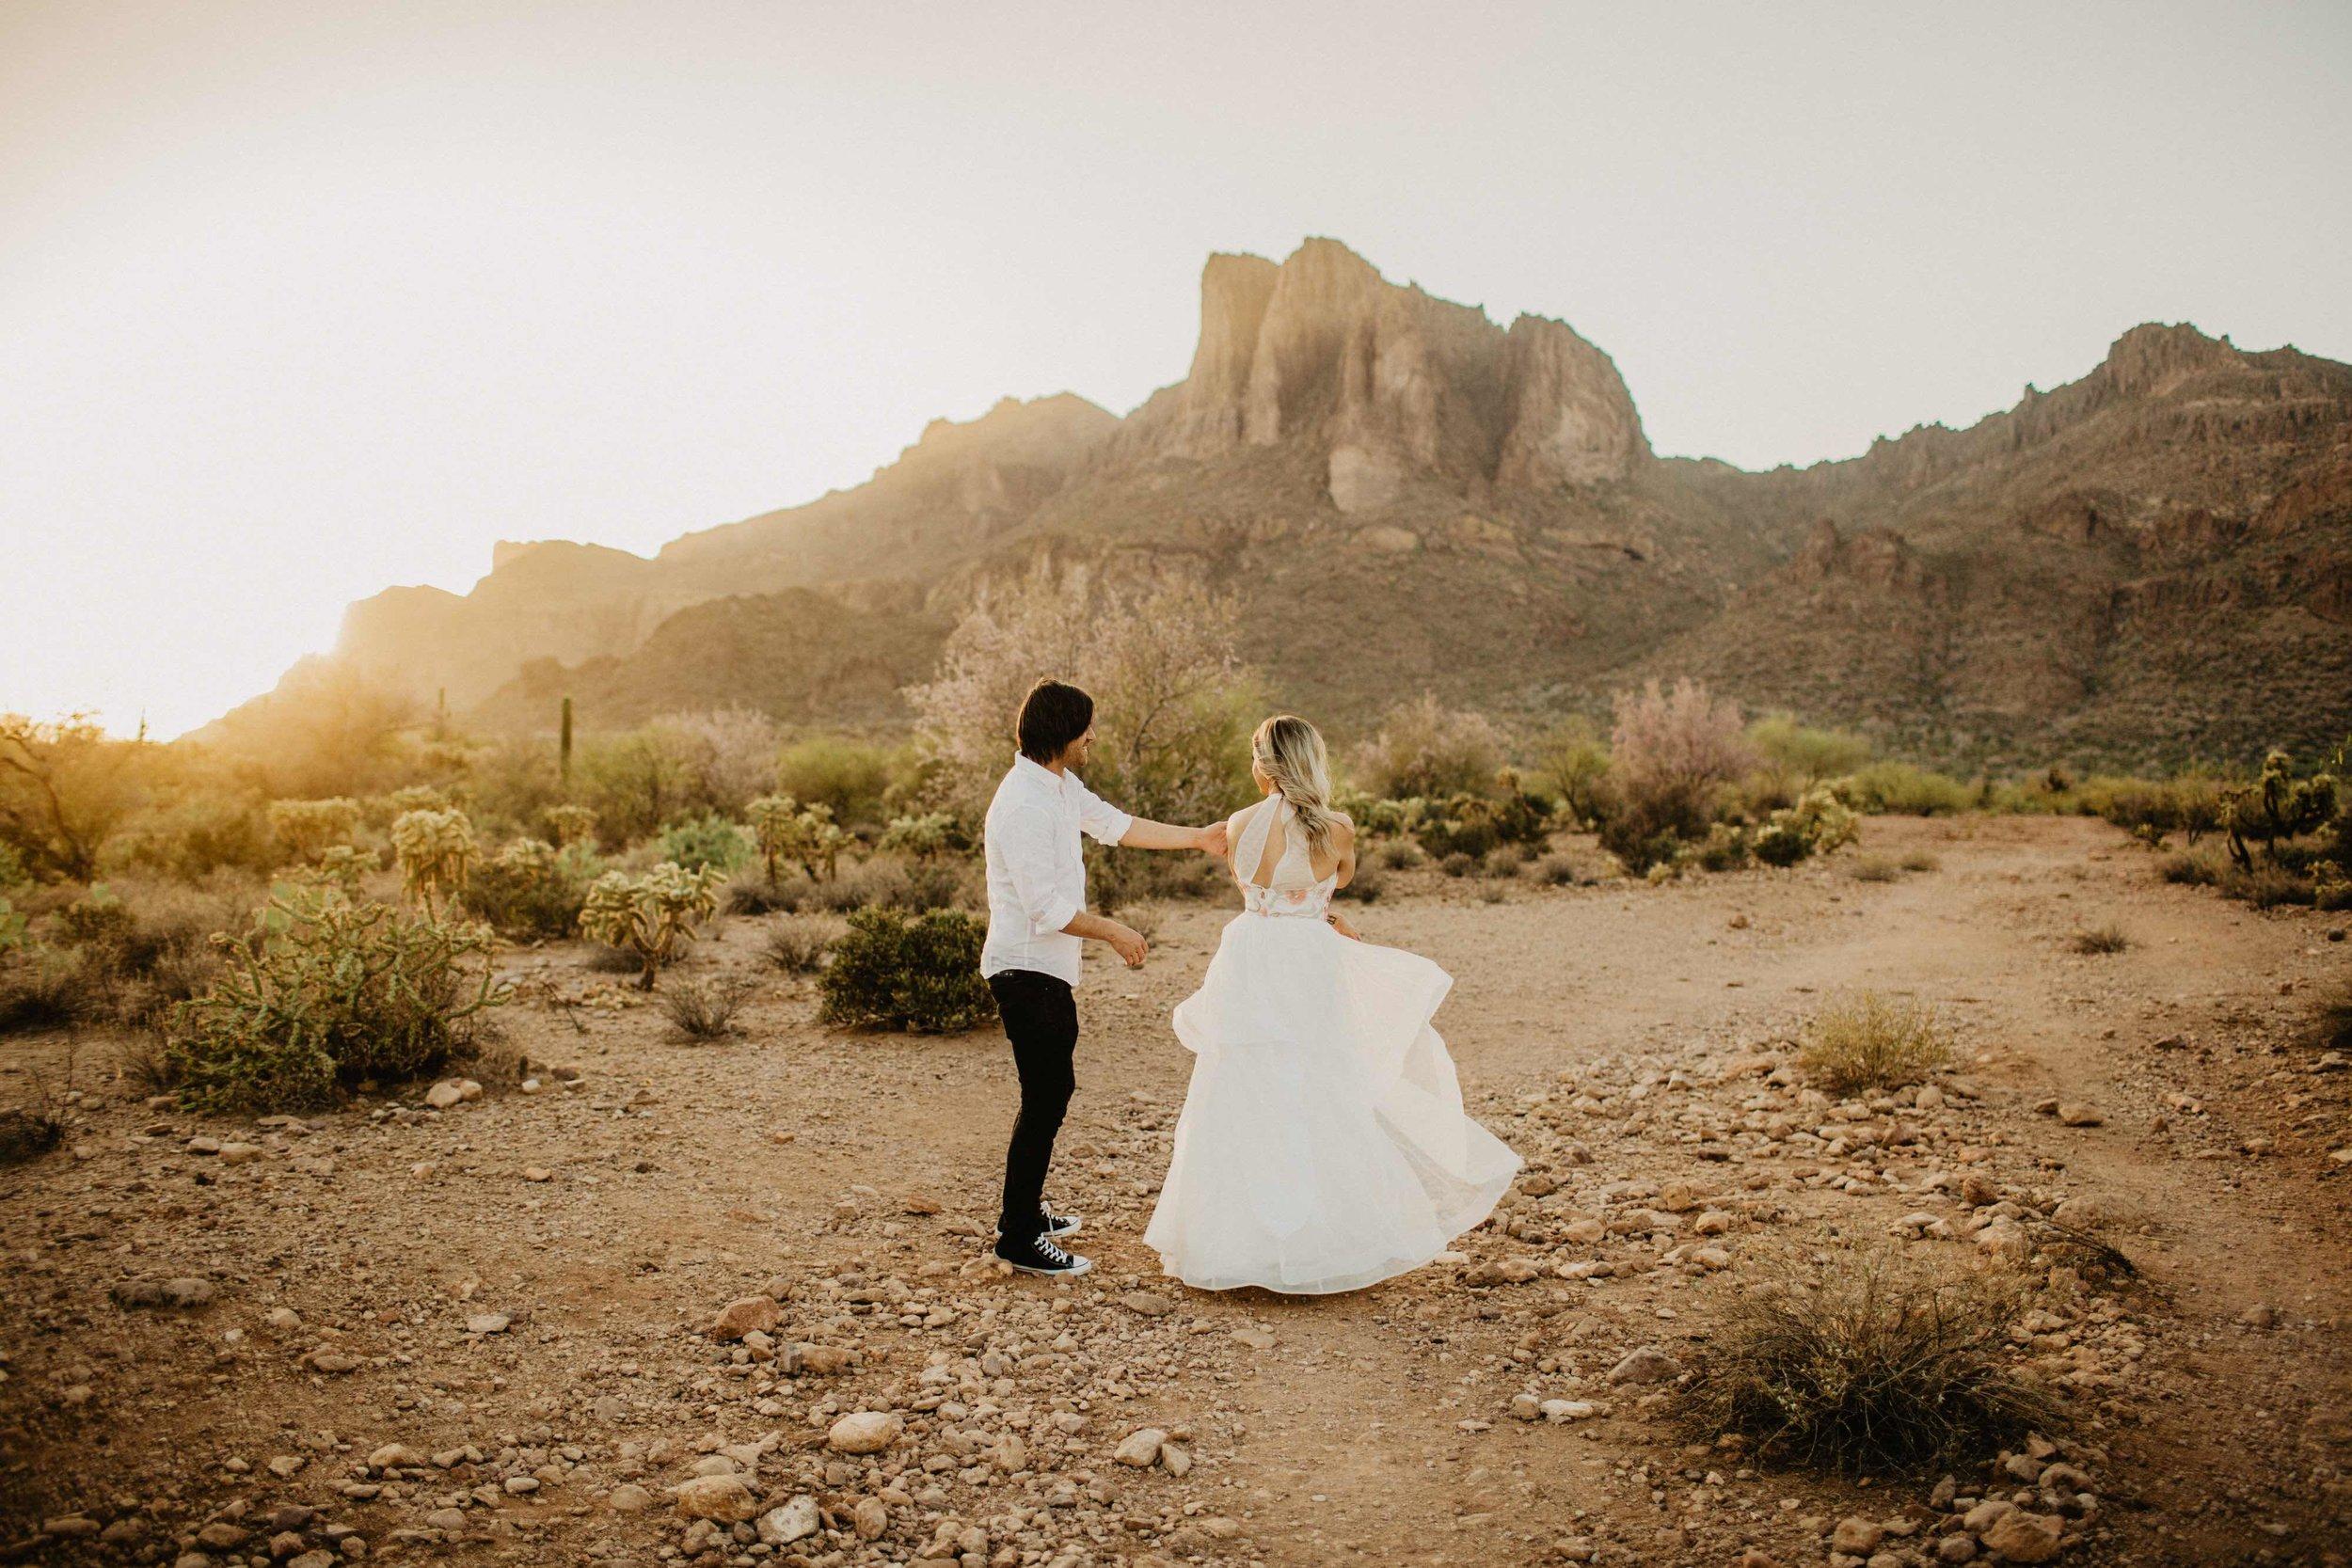 Kisa Conrad Favorites-0014-colorado-wedding-photographer-denver-springs-vail-.jpeg